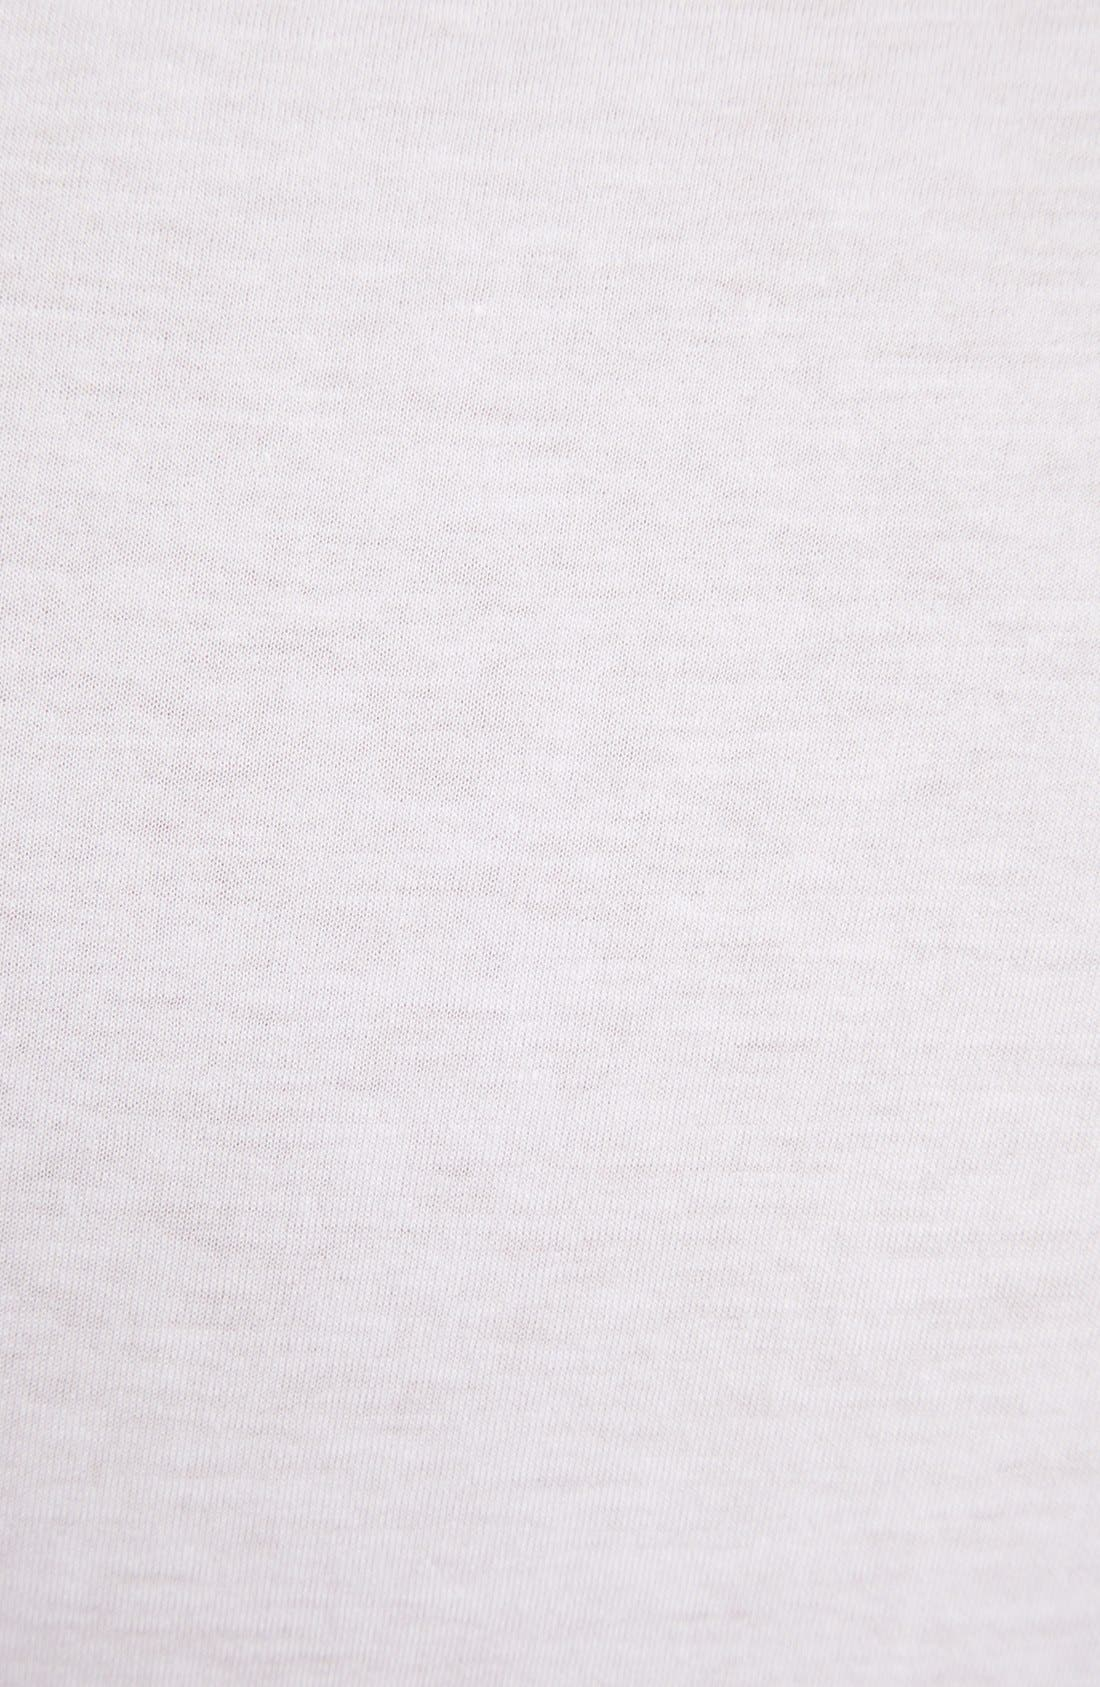 Alternate Image 3  - Michael Kors 'Soft Touch' Crewneck T-Shirt (3-Pack)